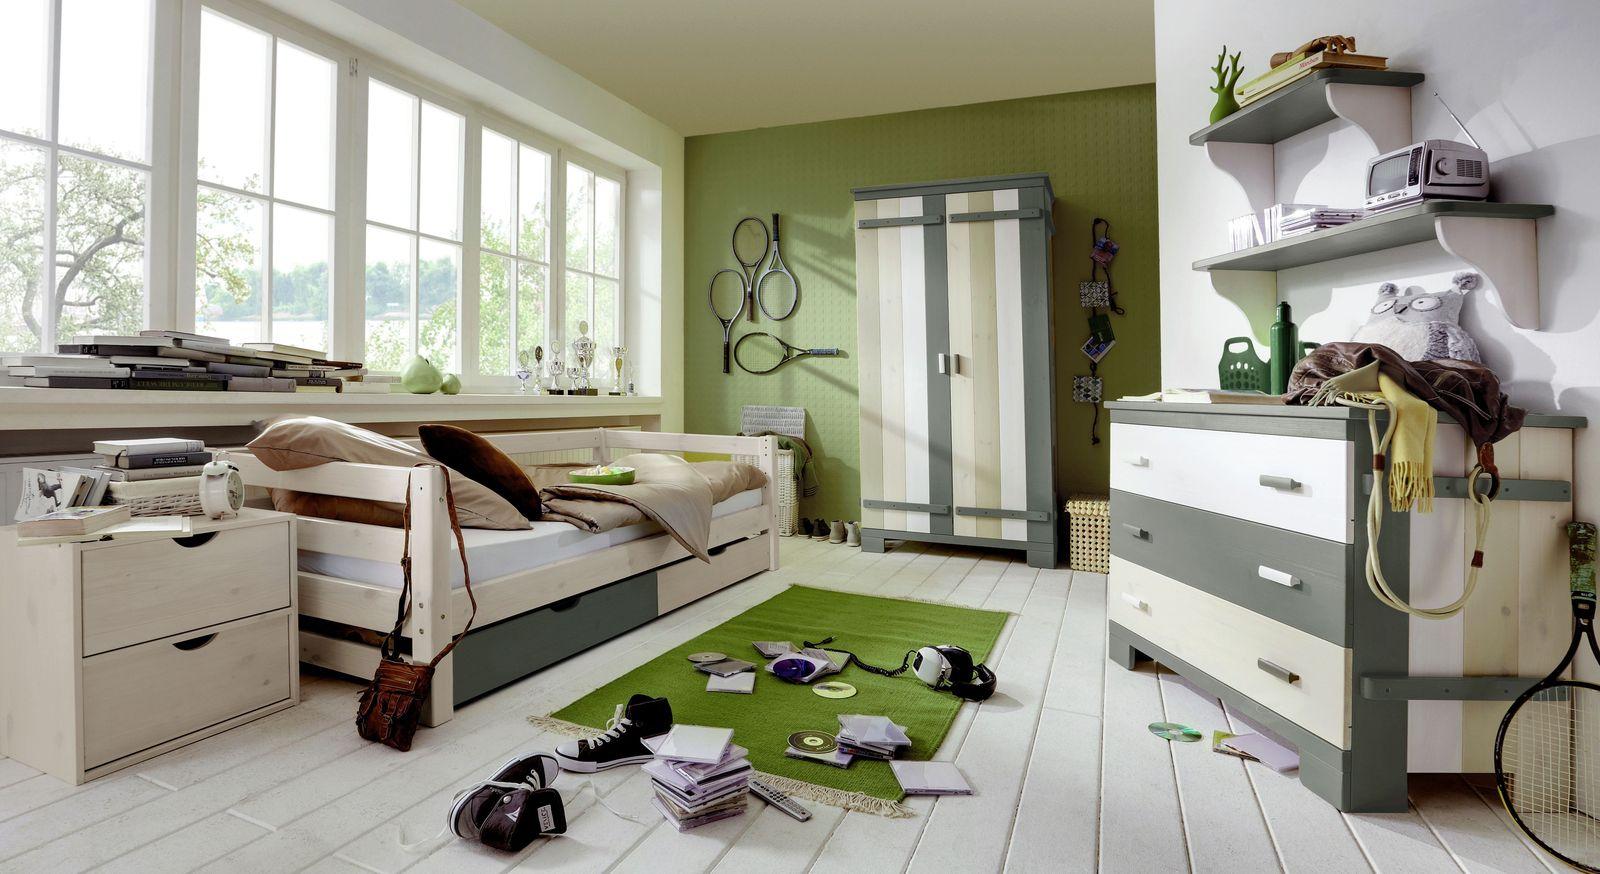 Schubkasten-Kinderbett Kids Paradise Laubhütte mit passenden Möbeln